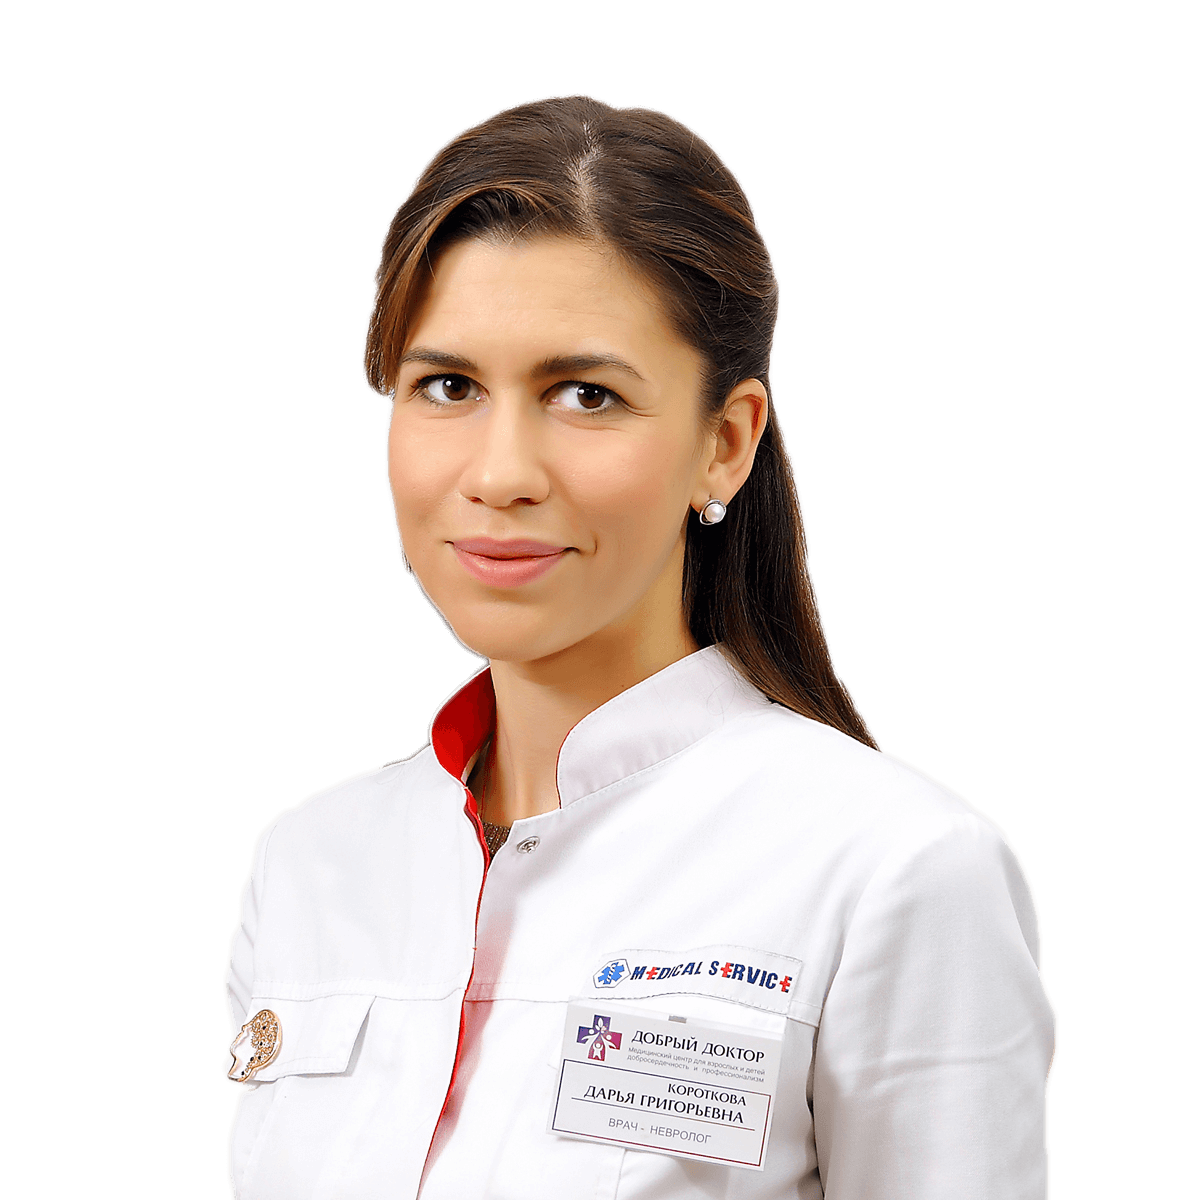 Короткова Дарья Григорьевна